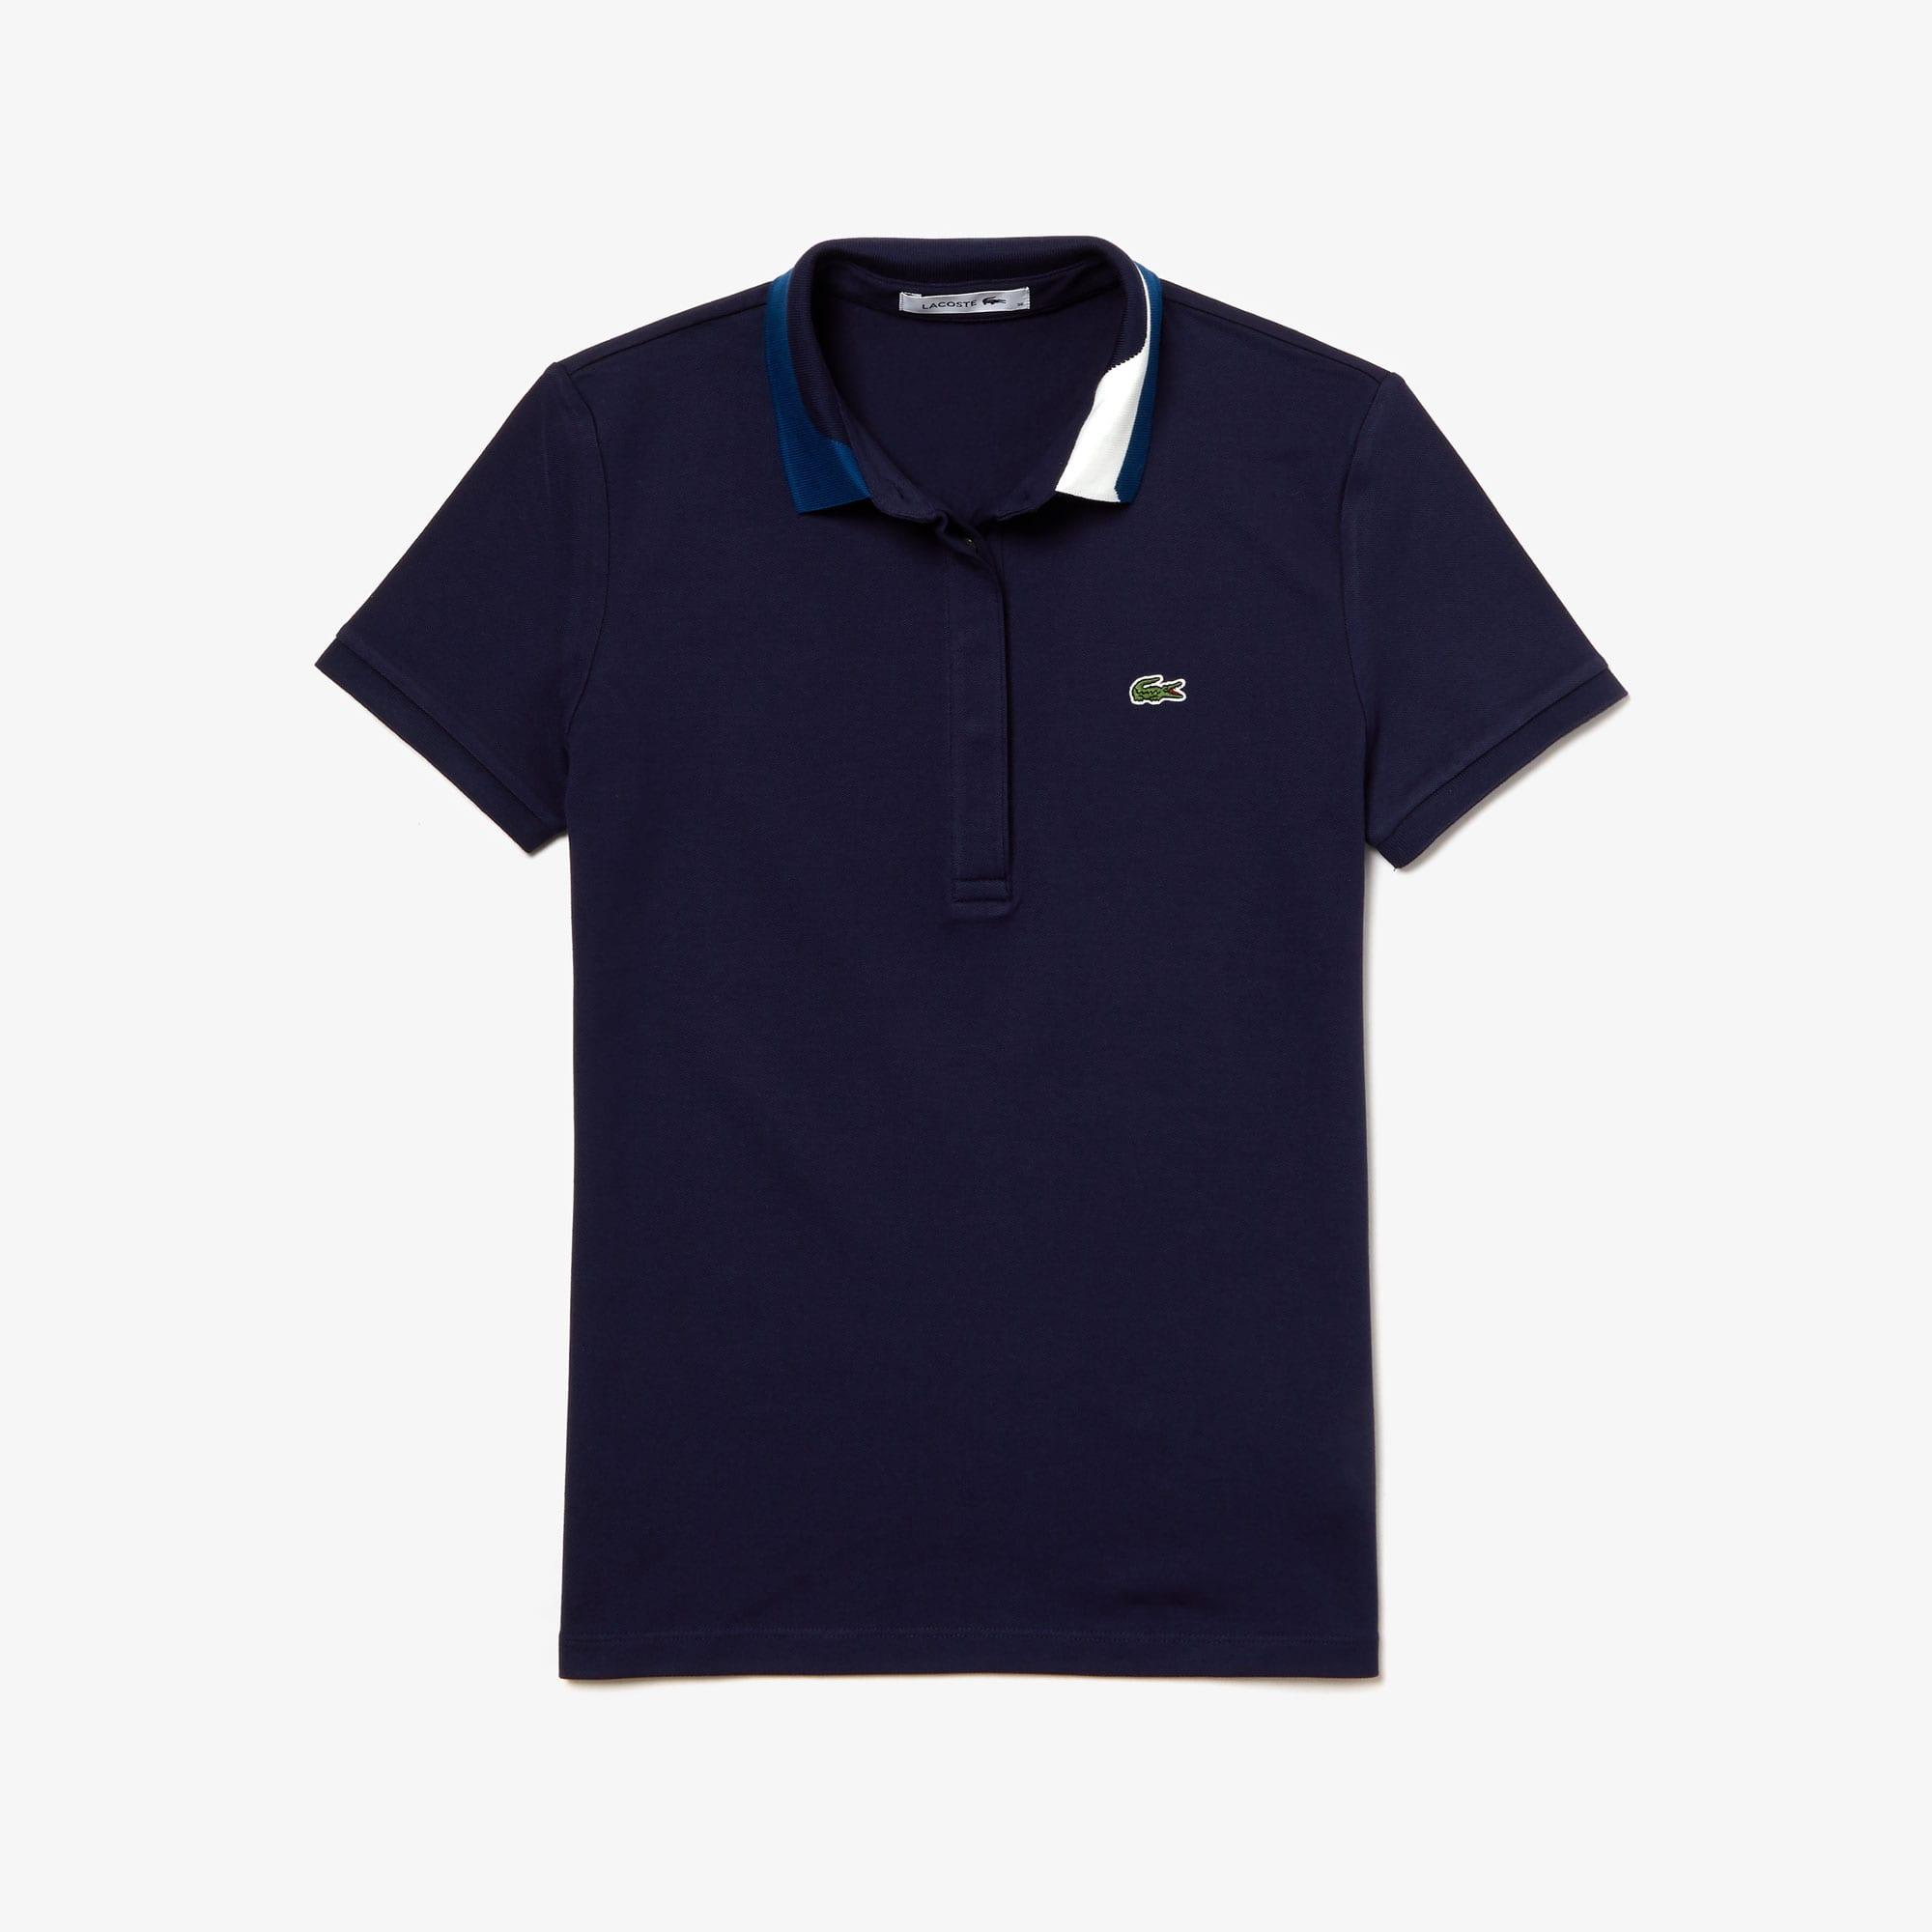 Lacoste Tops Women's Slim Fit Stretch Piqué Polo Shirt